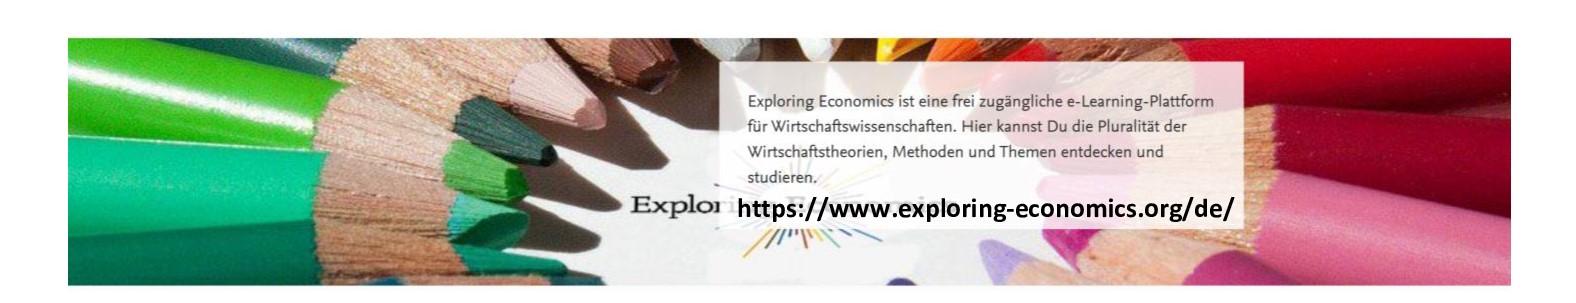 Exploring-Economics-1jpg